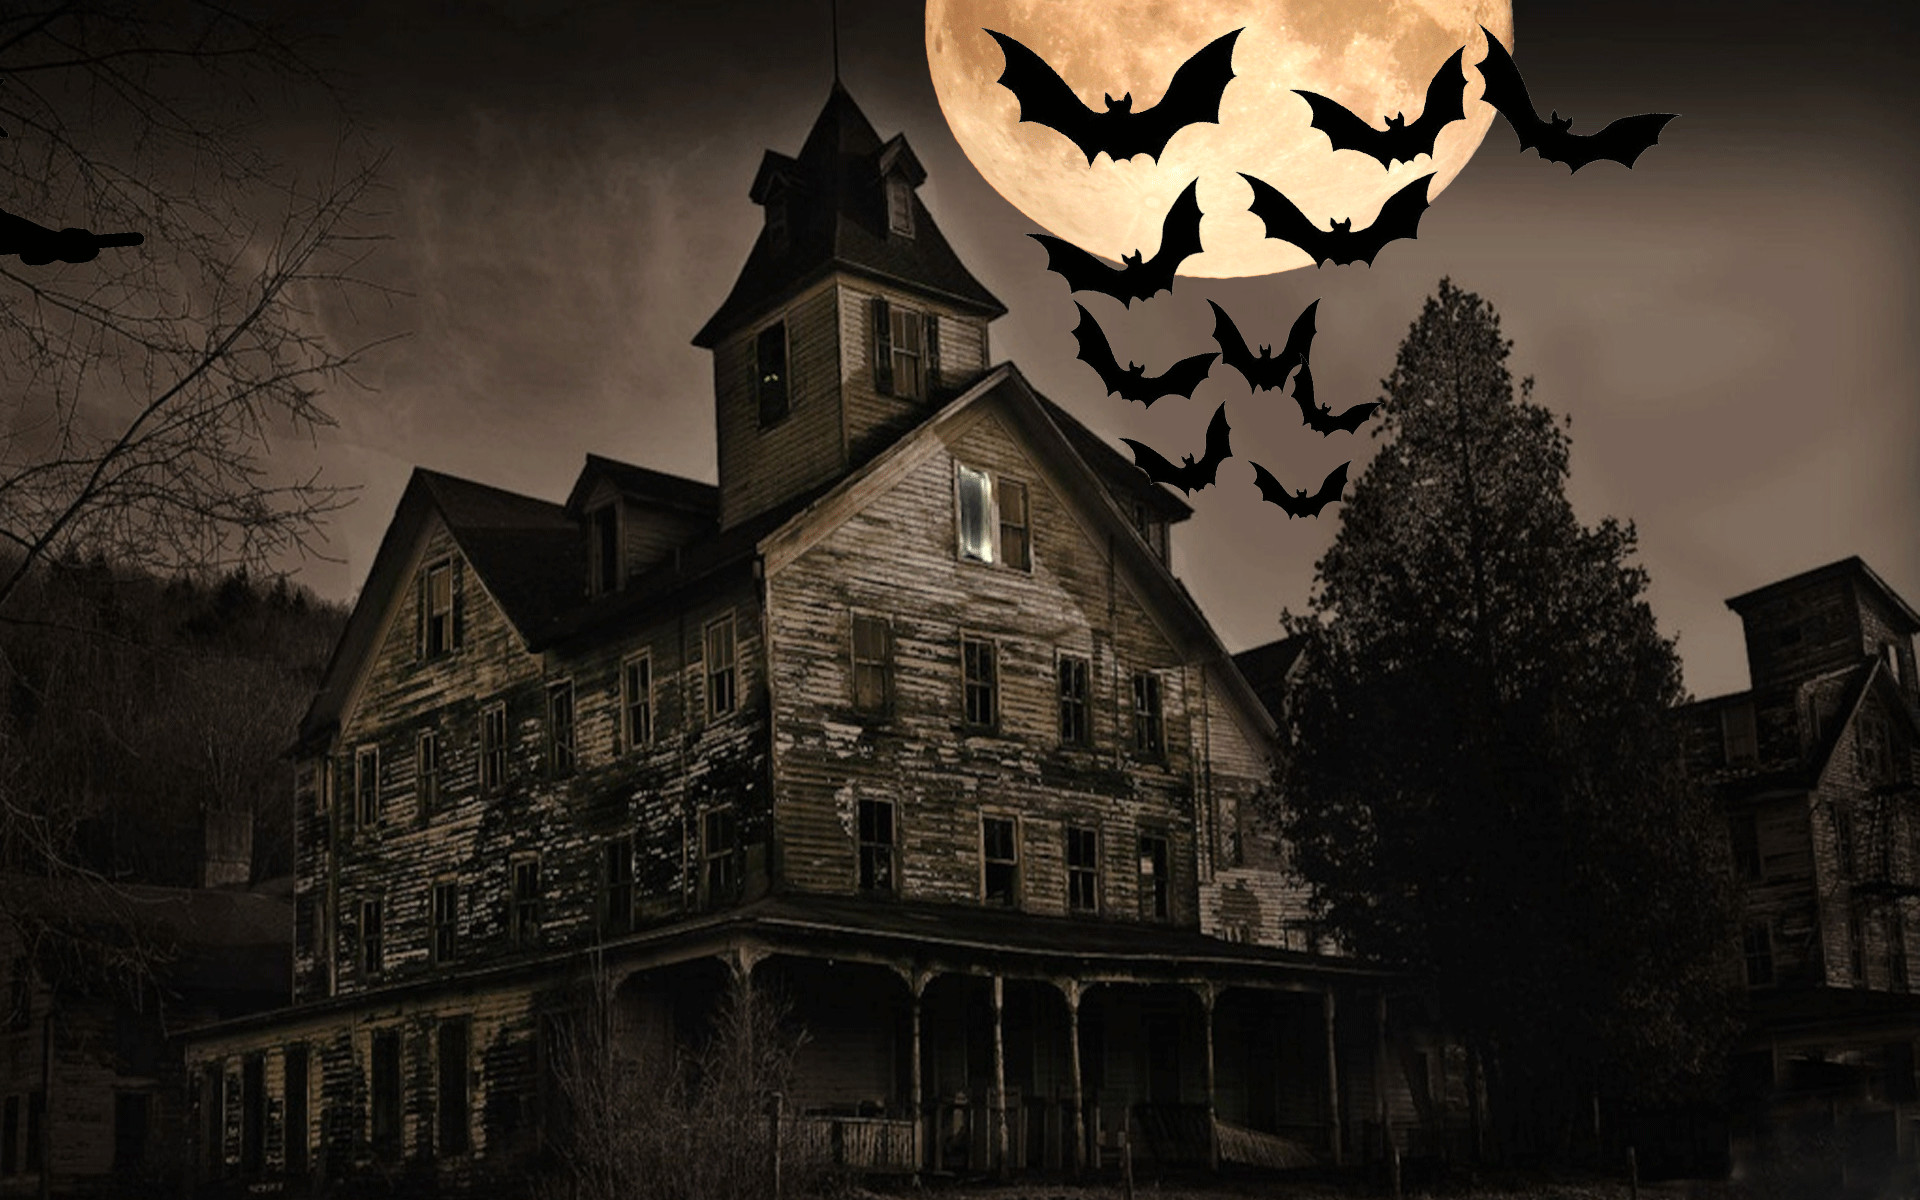 animaatjes halloween 50125; witchandbats witchandbats:  c7877759db9907cdfc69c9a710be8f17 d6sh8yc